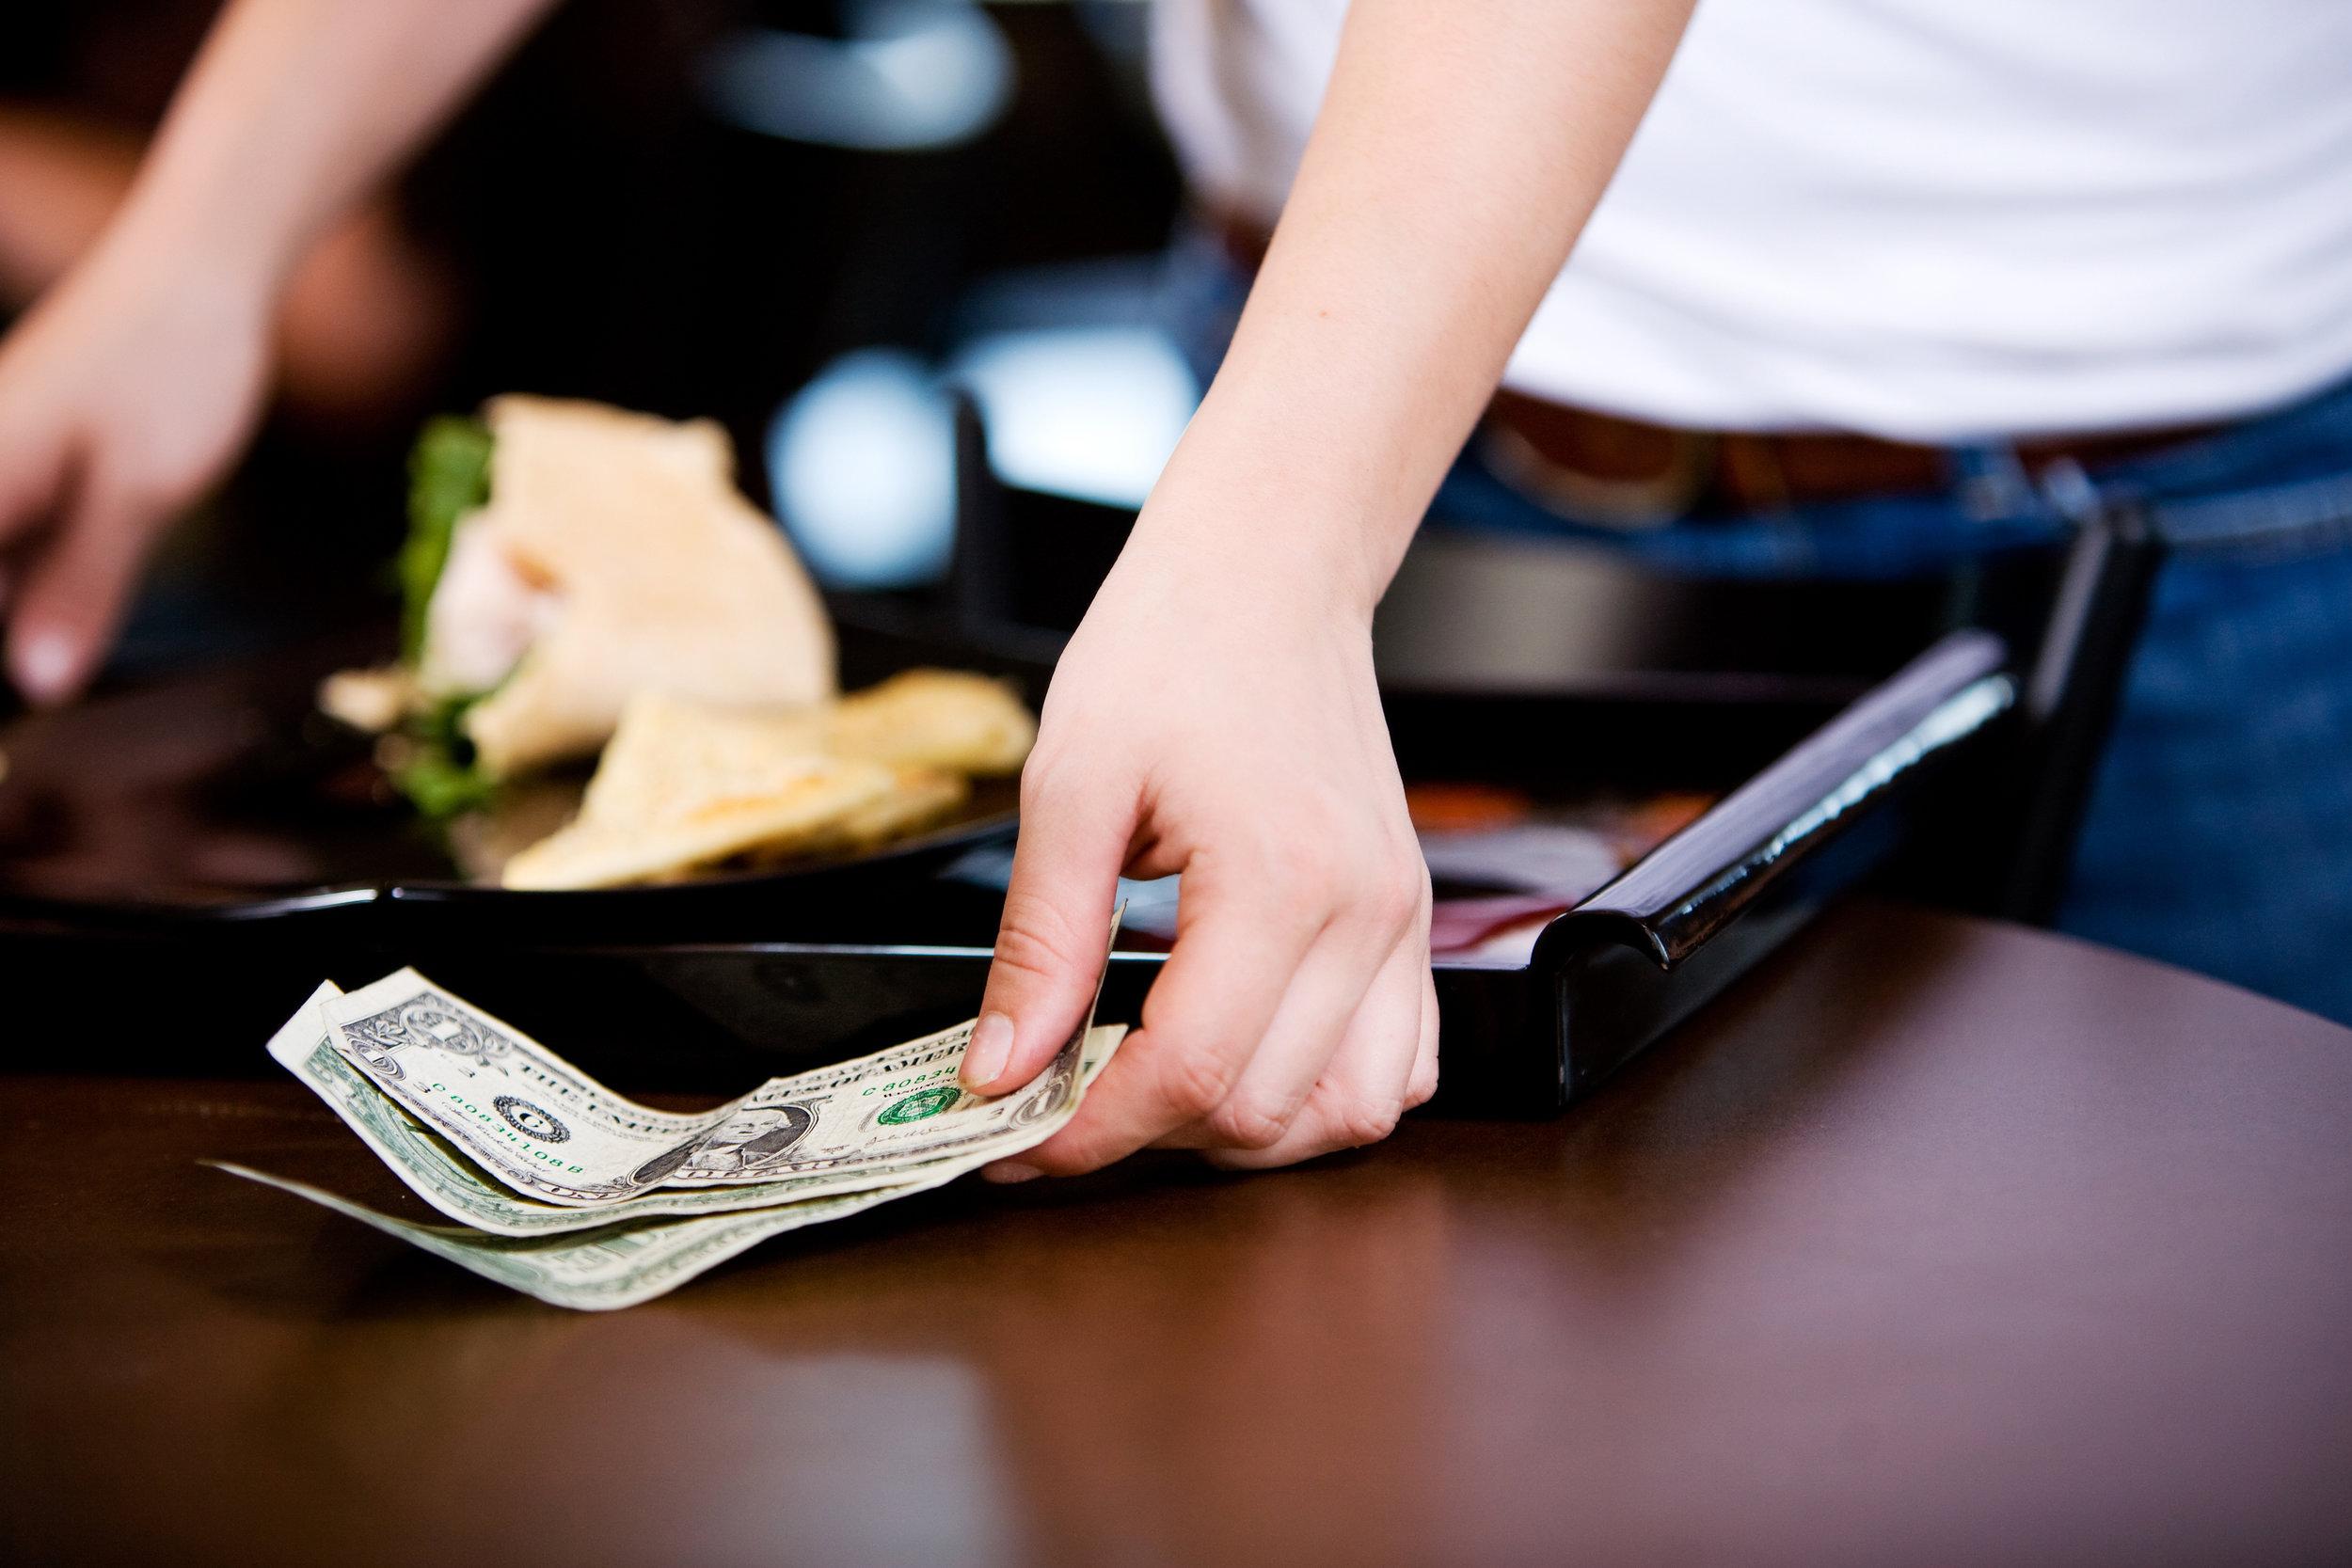 restaurant worker with tip